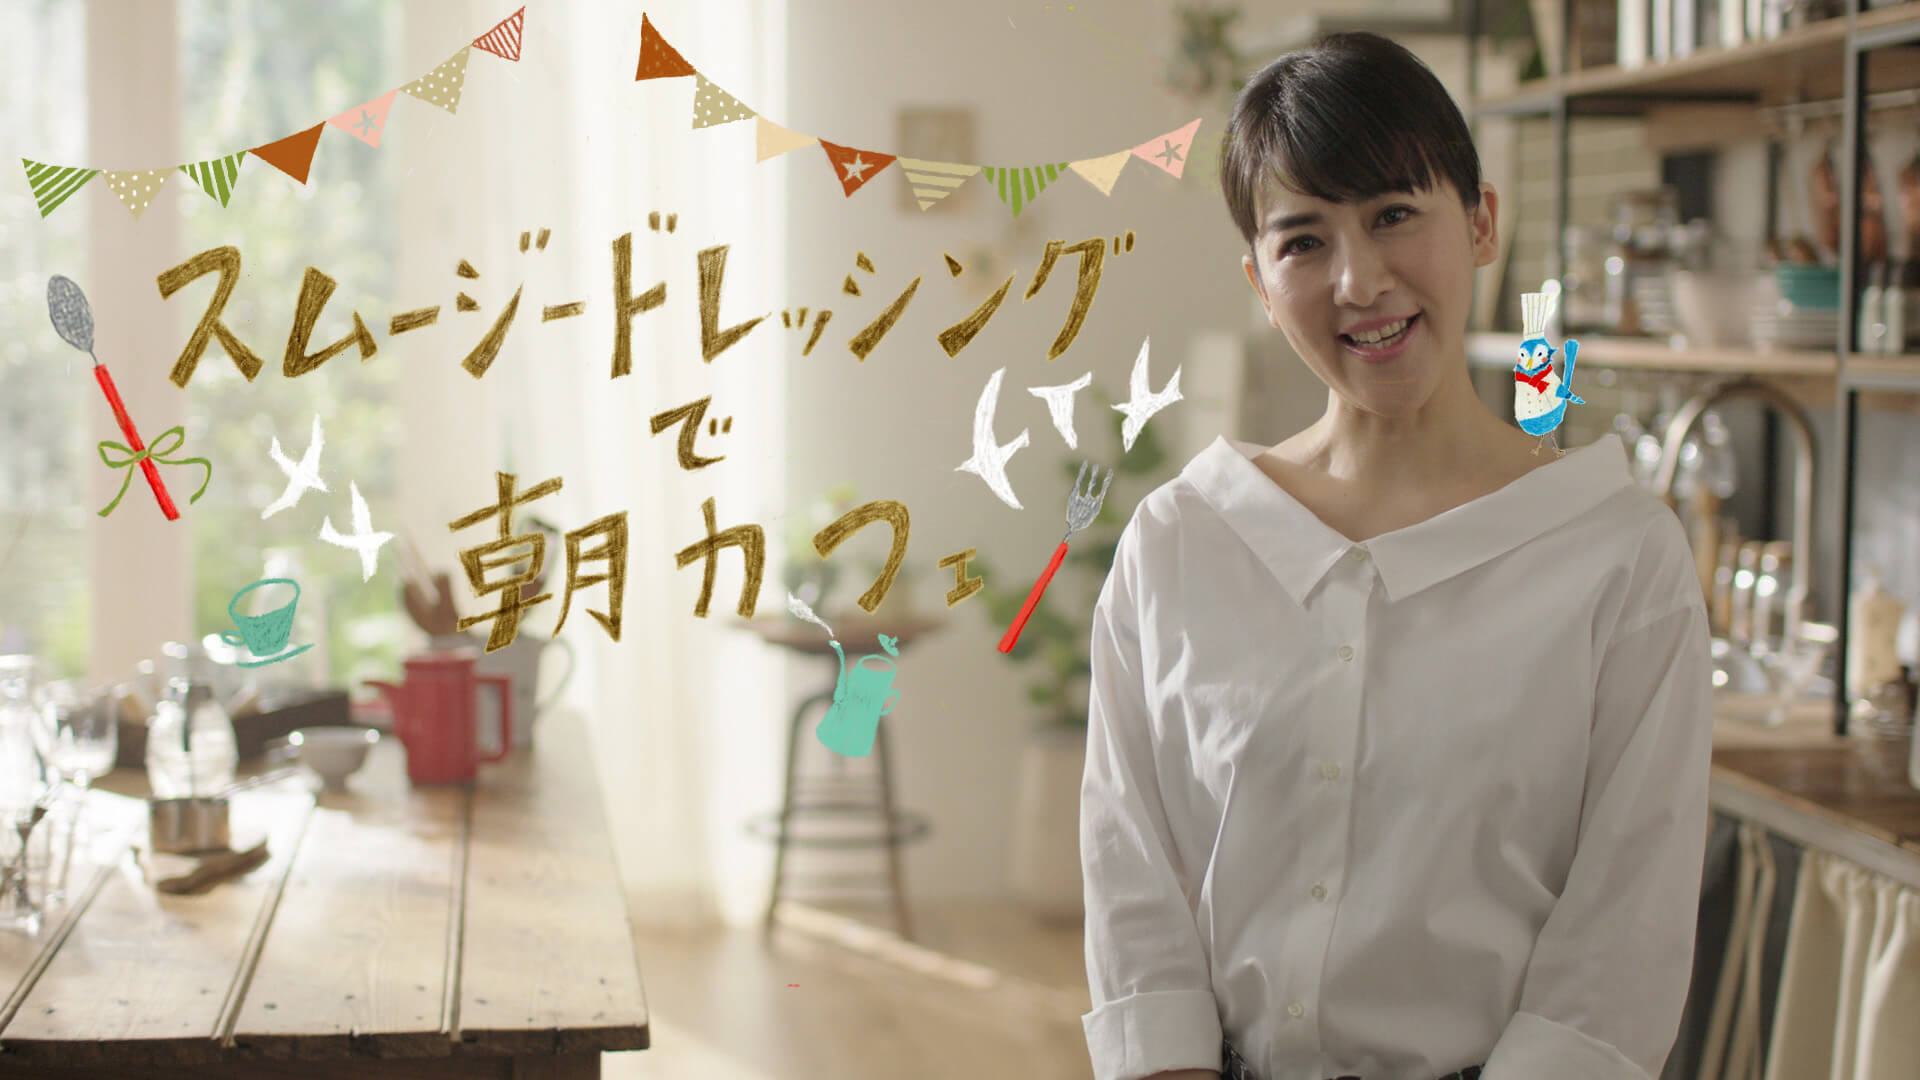 TVCM 日清オイリオ2017年「スムージードレッシングで朝カフェ」